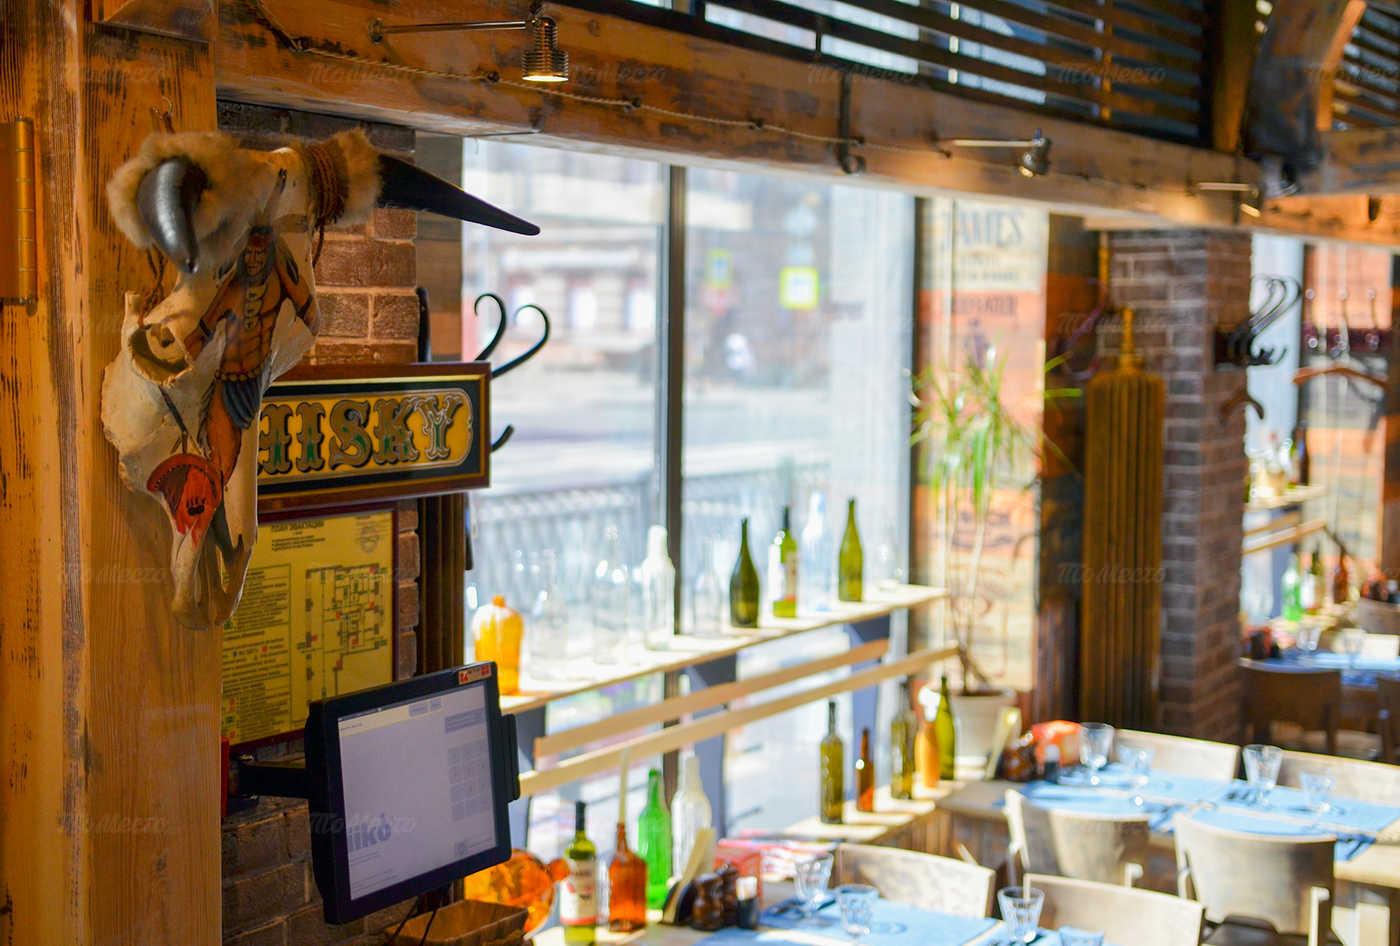 Ресторан Монтана (Montana saloon) на Кирочной улице фото 21